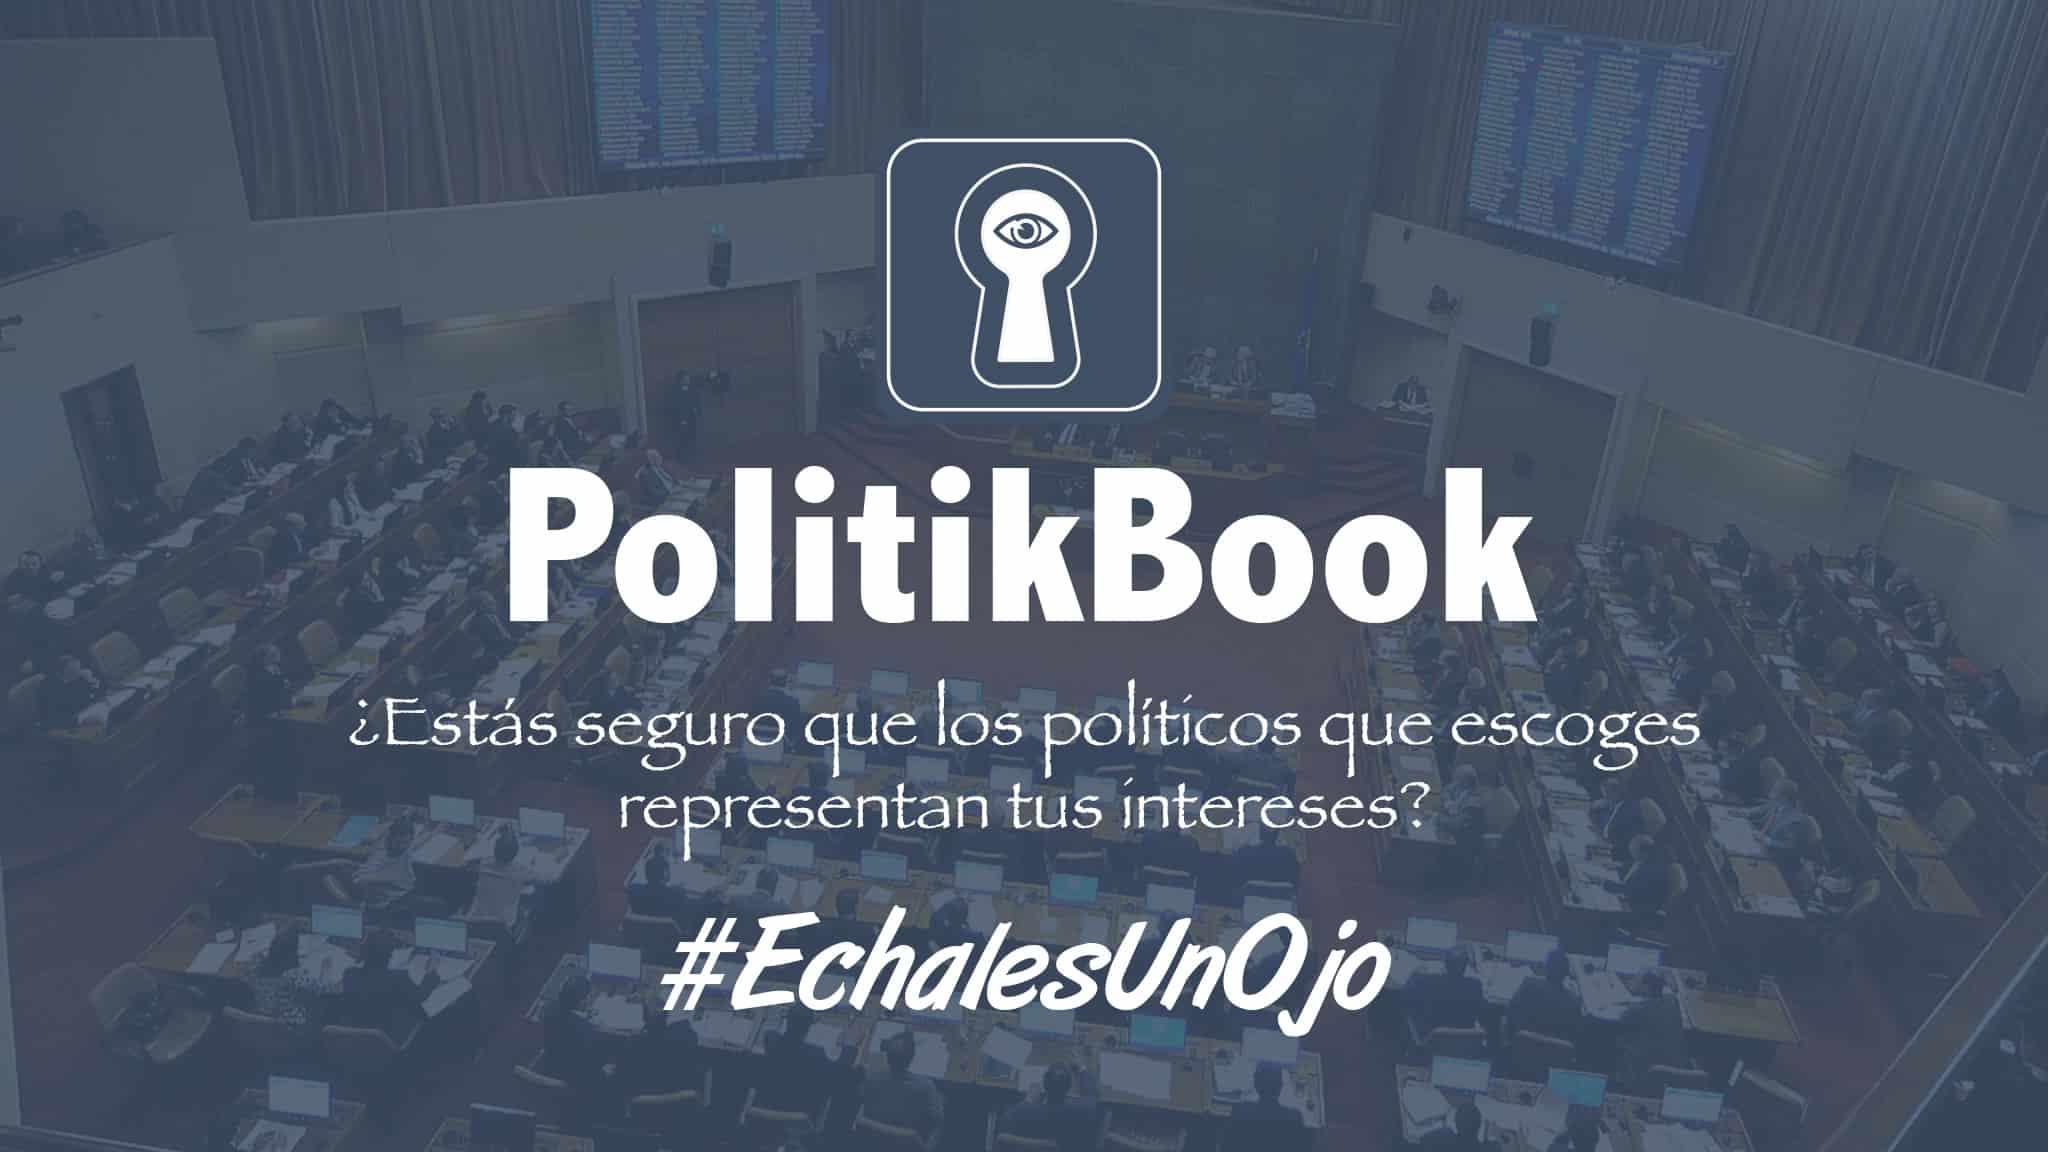 PolitikBook.